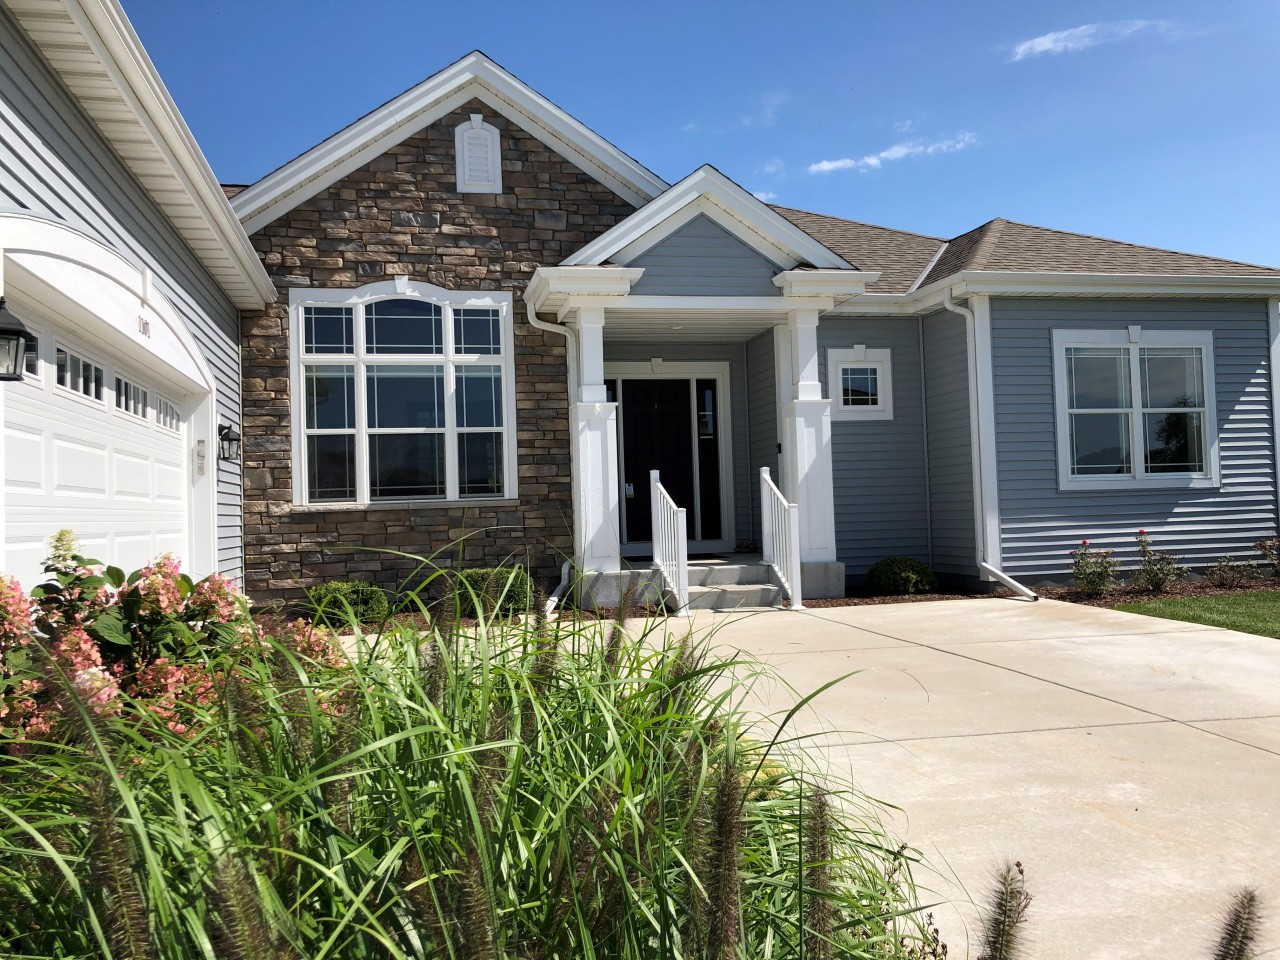 1101 Pine Ridge Ct, Oconomowoc, Wisconsin 53066, 3 Bedrooms Bedrooms, ,2 BathroomsBathrooms,Single-Family,For Sale,Pine Ridge Ct,1655219